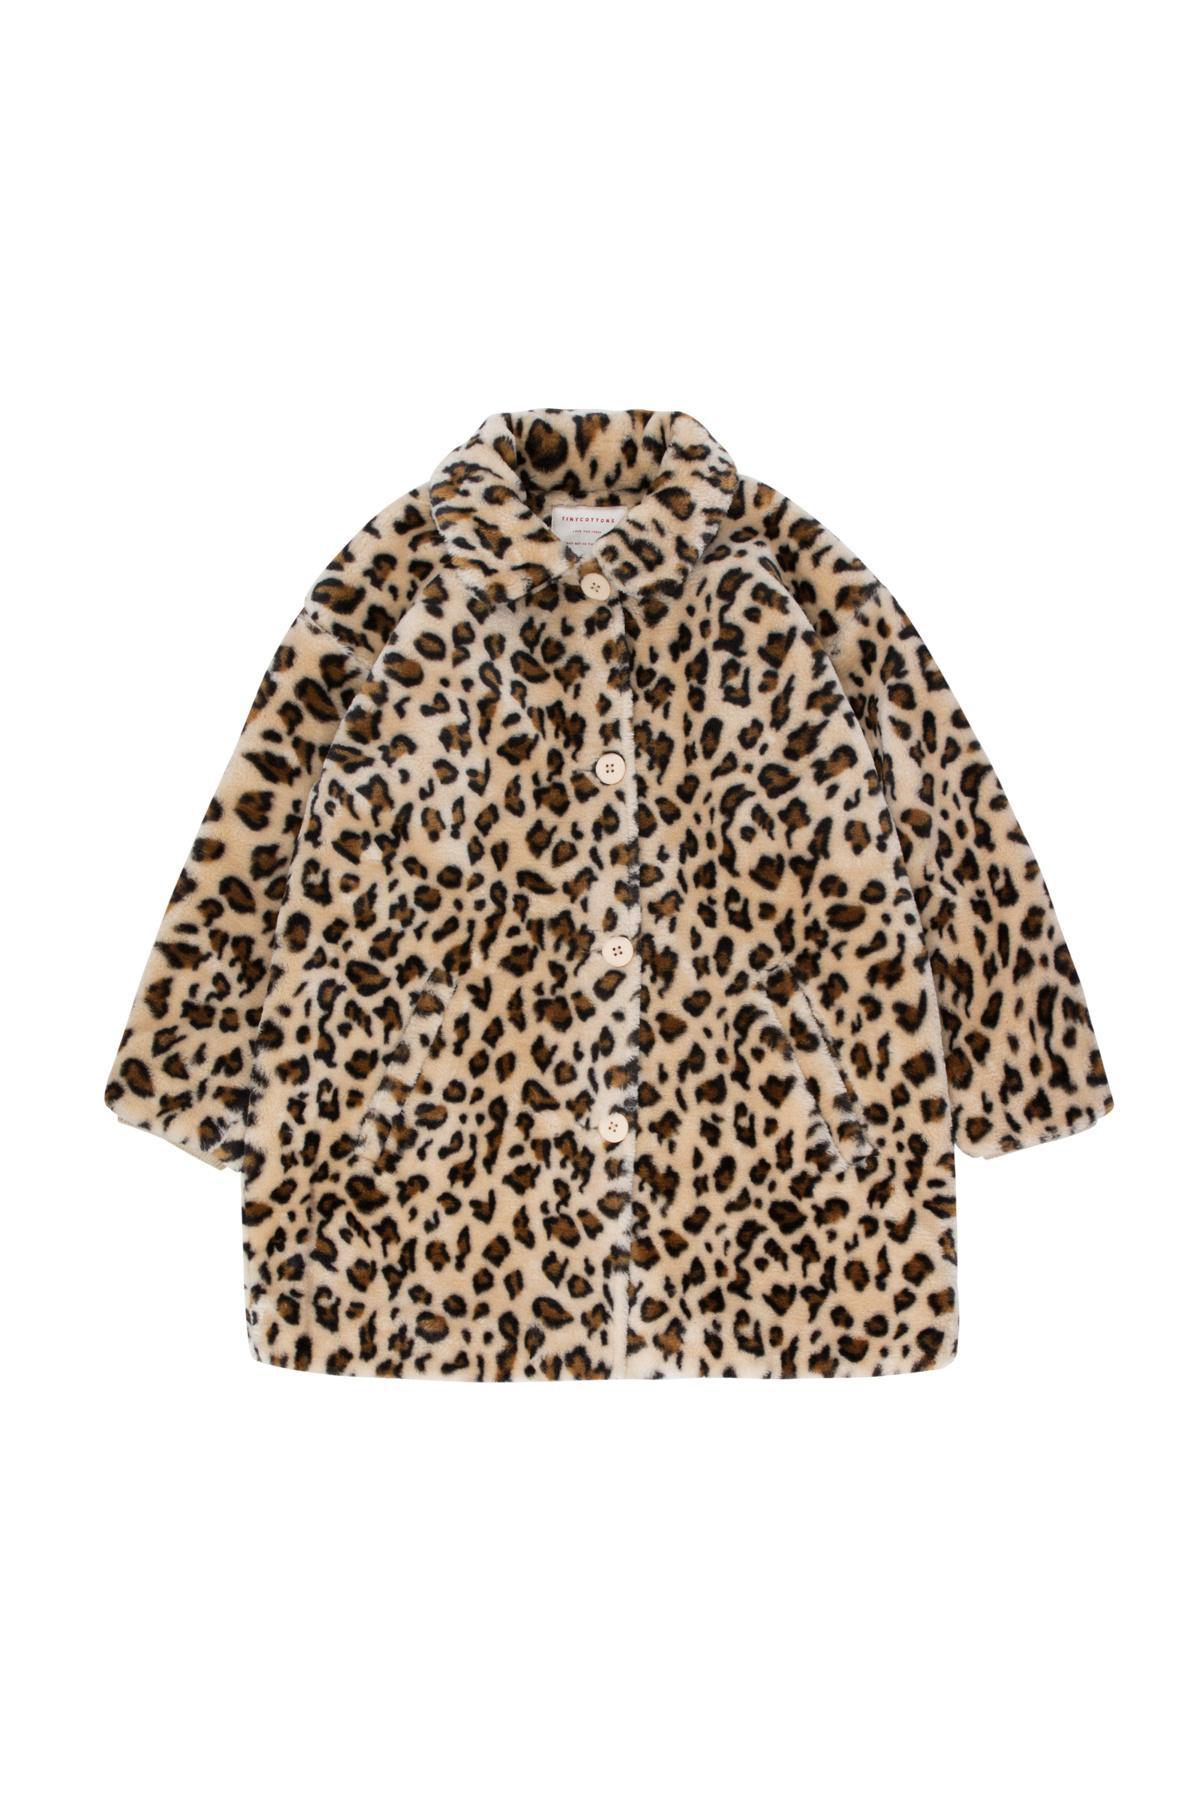 Tiny Cottons Faux fur coat light cream | brown